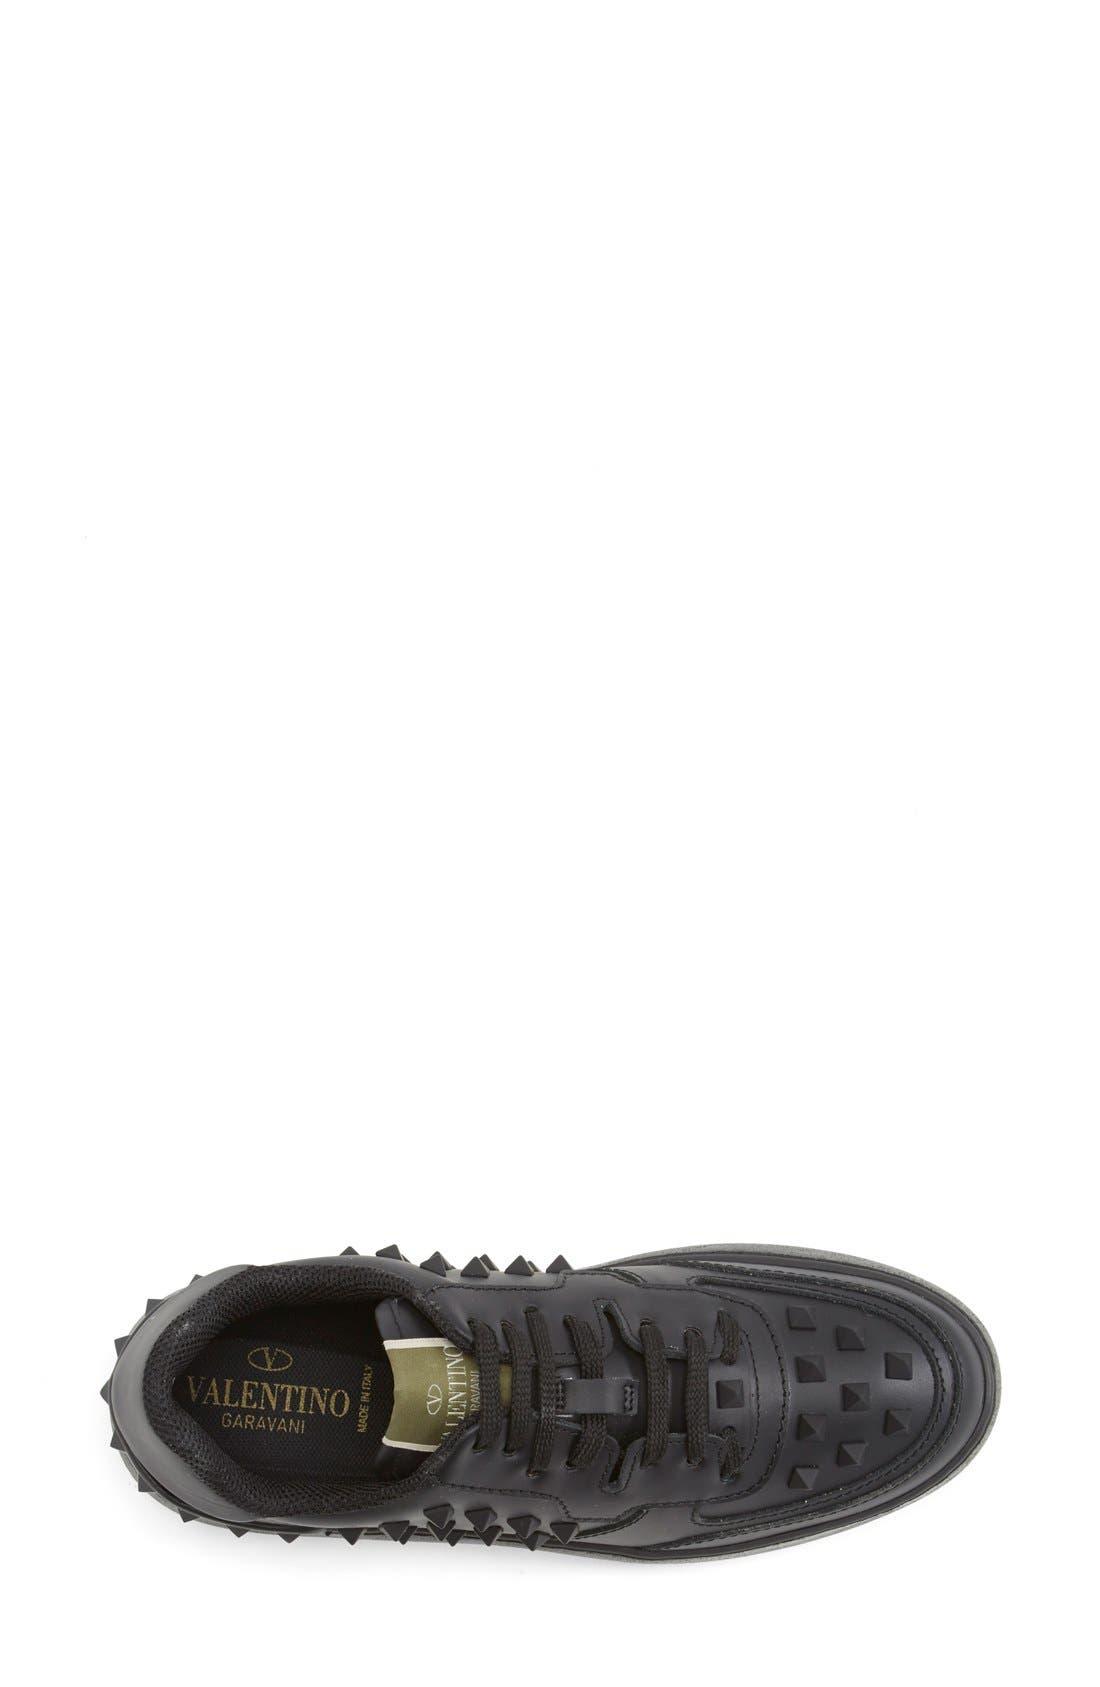 Alternate Image 3  - Valentino 'Rock Be' Sneaker (Women)